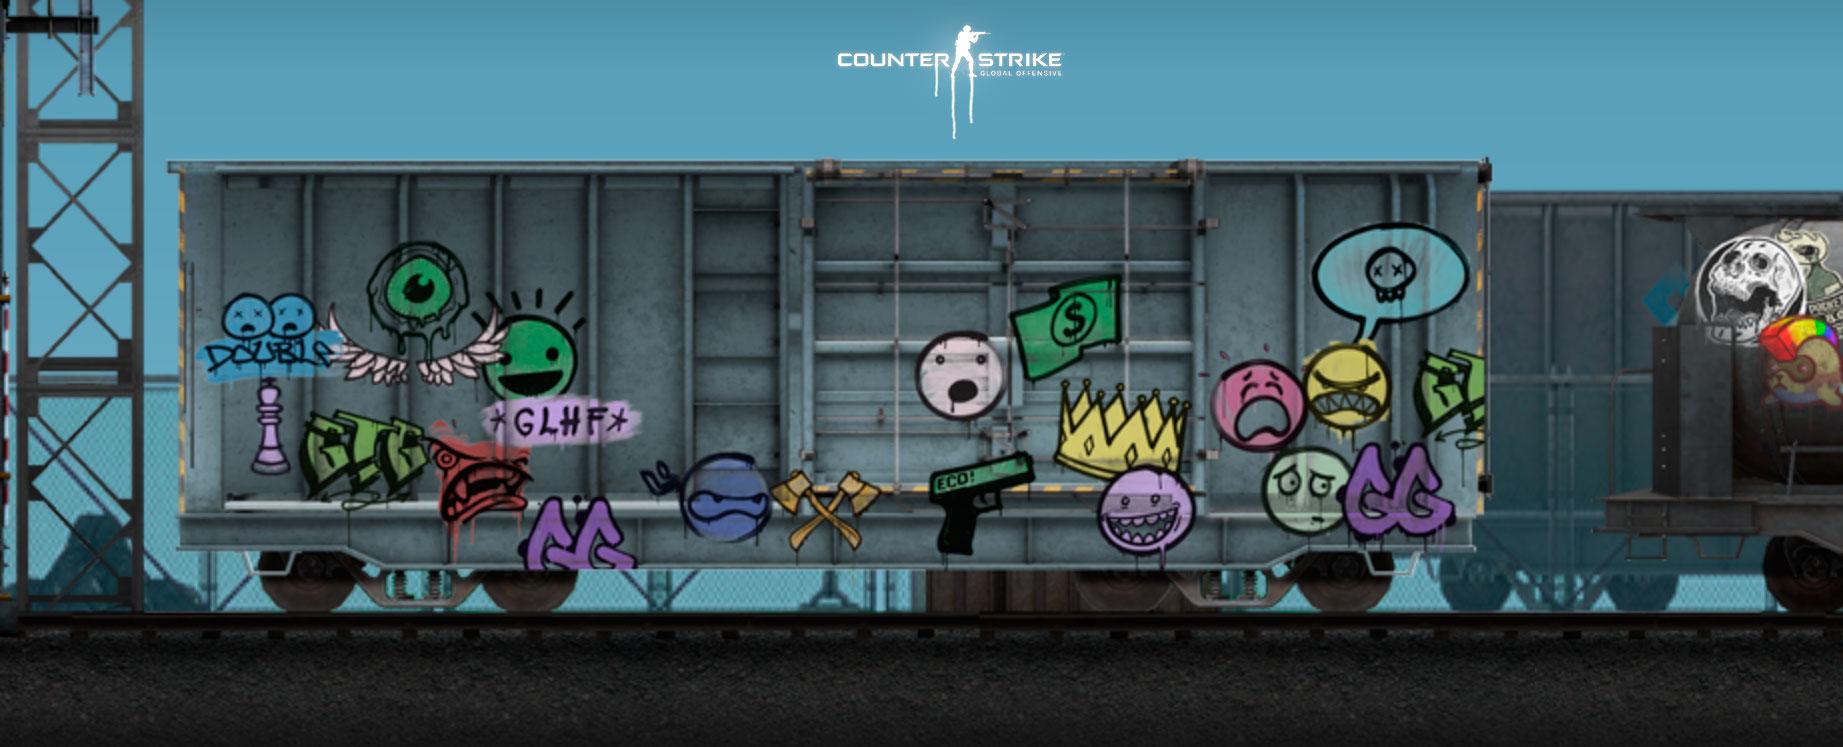 graffitis-csgo